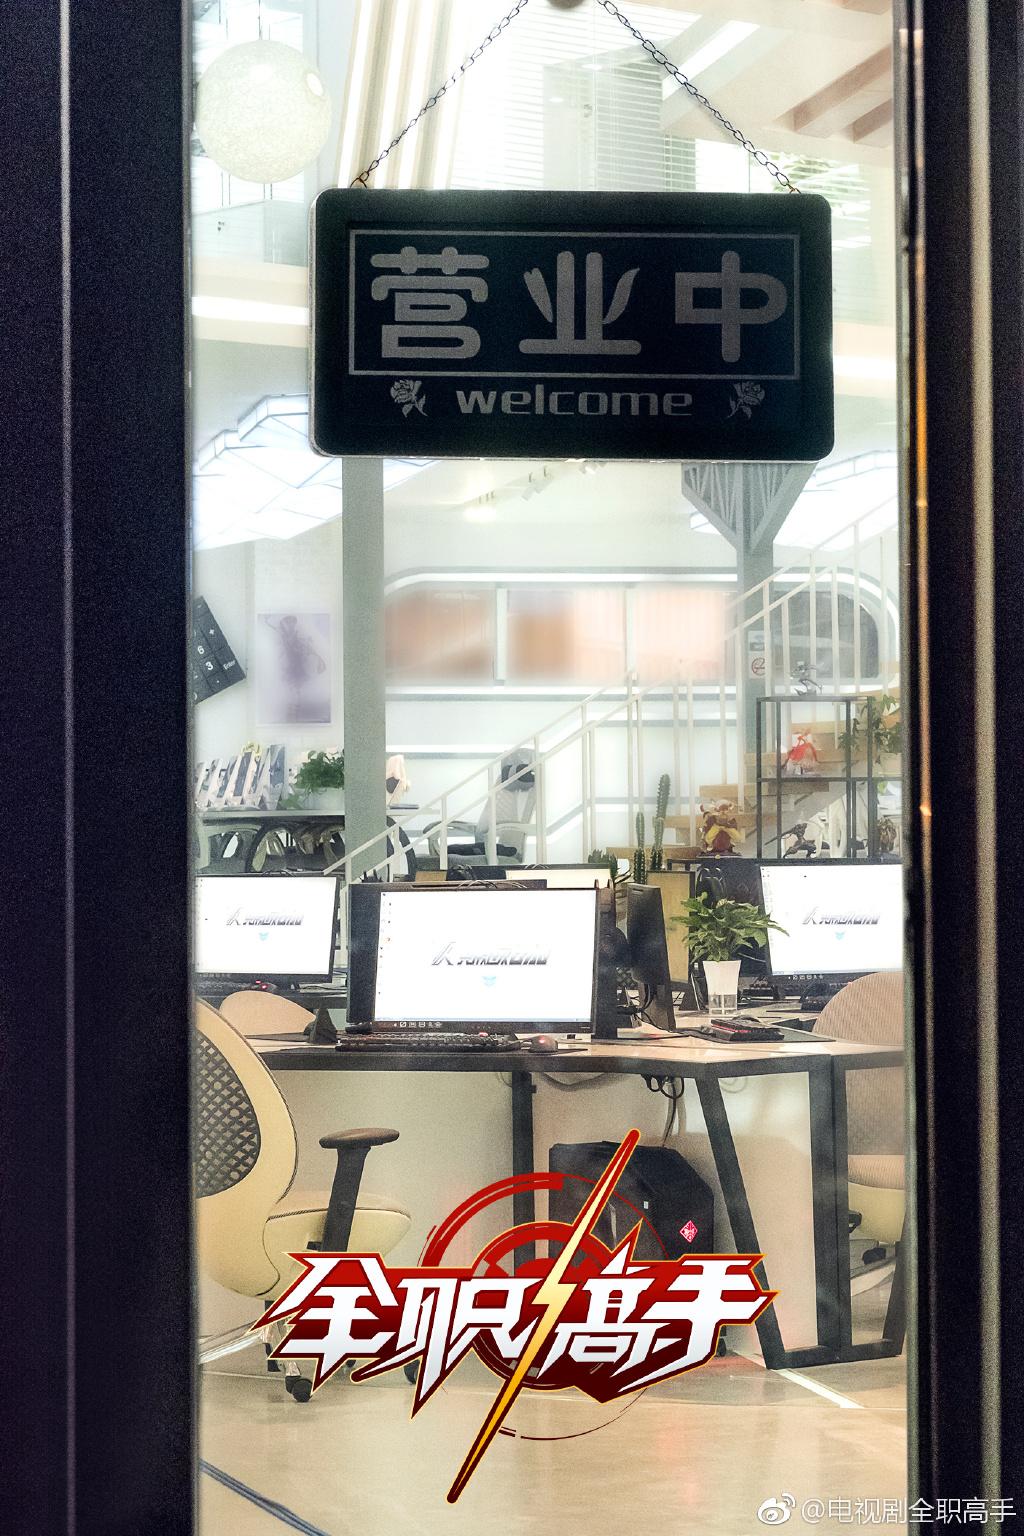 TKA Live Action - Happy Internet Cafe